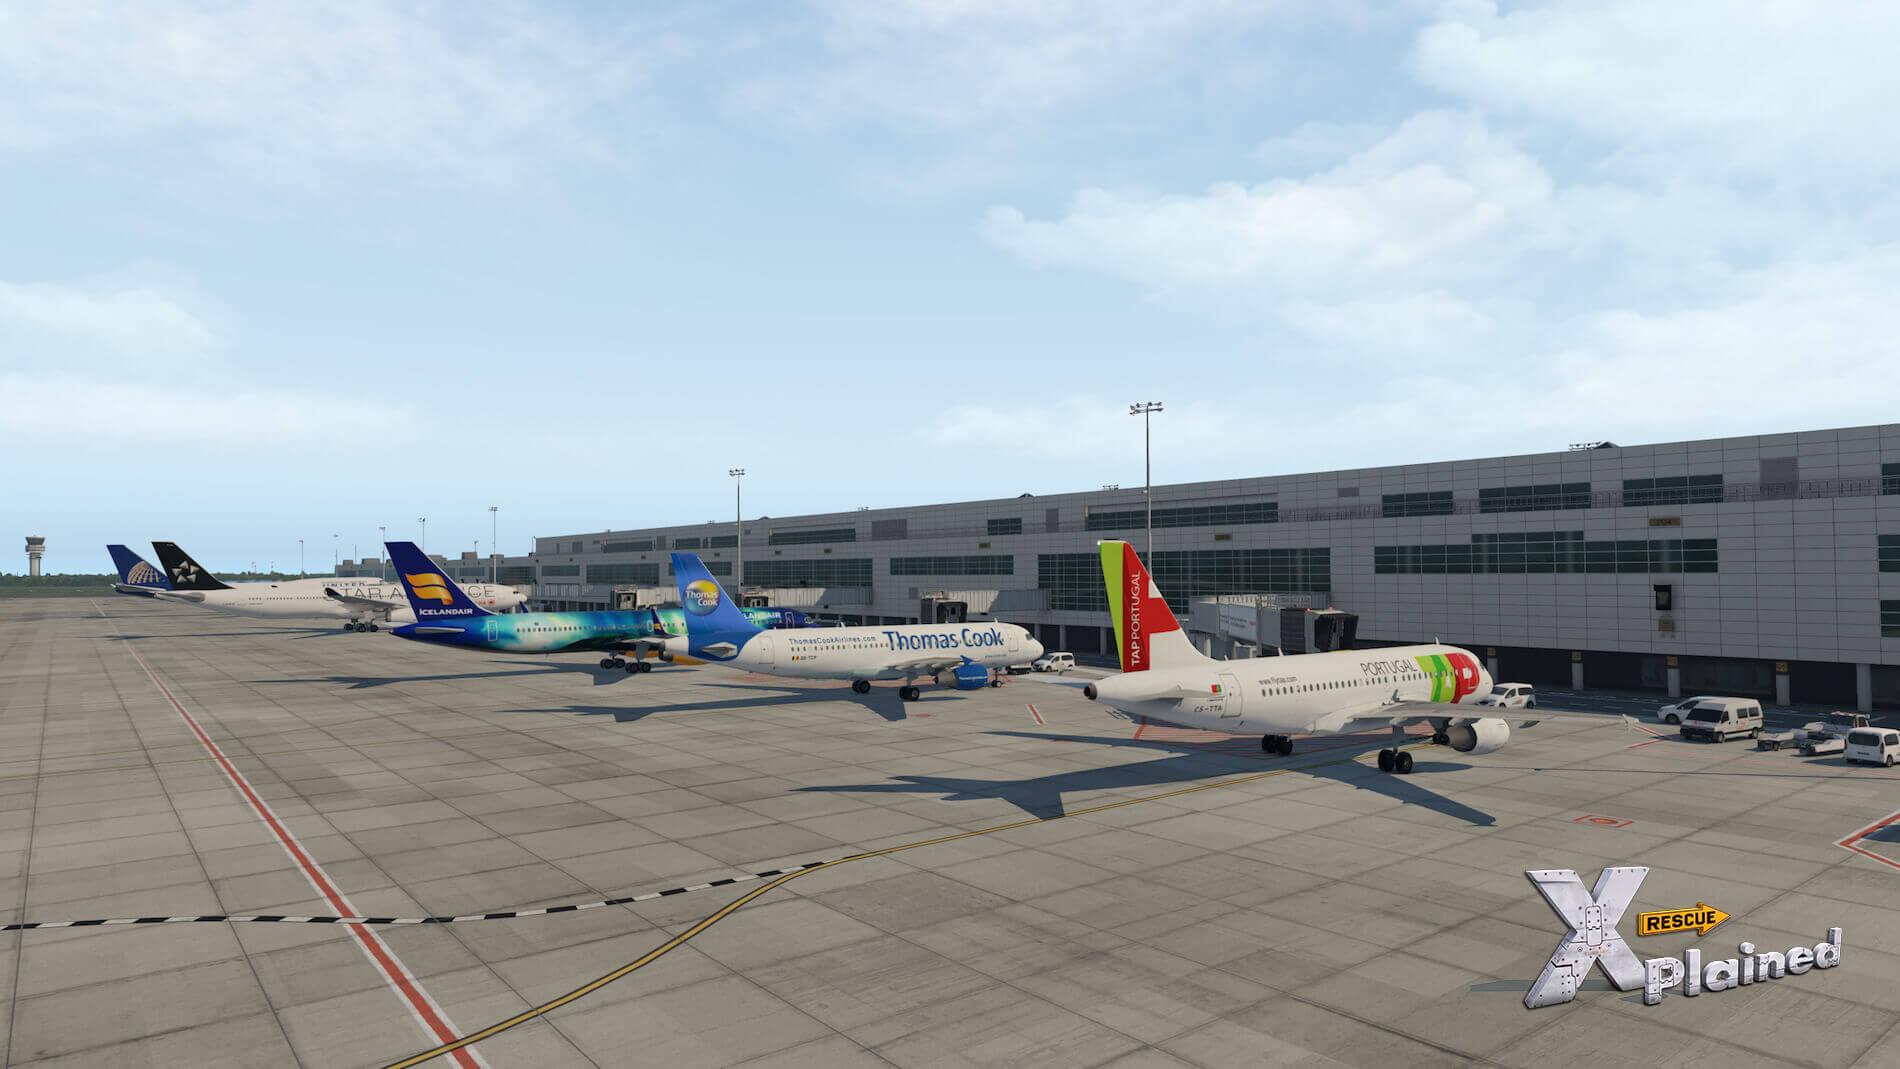 JustSim-EBBR-Airport-23